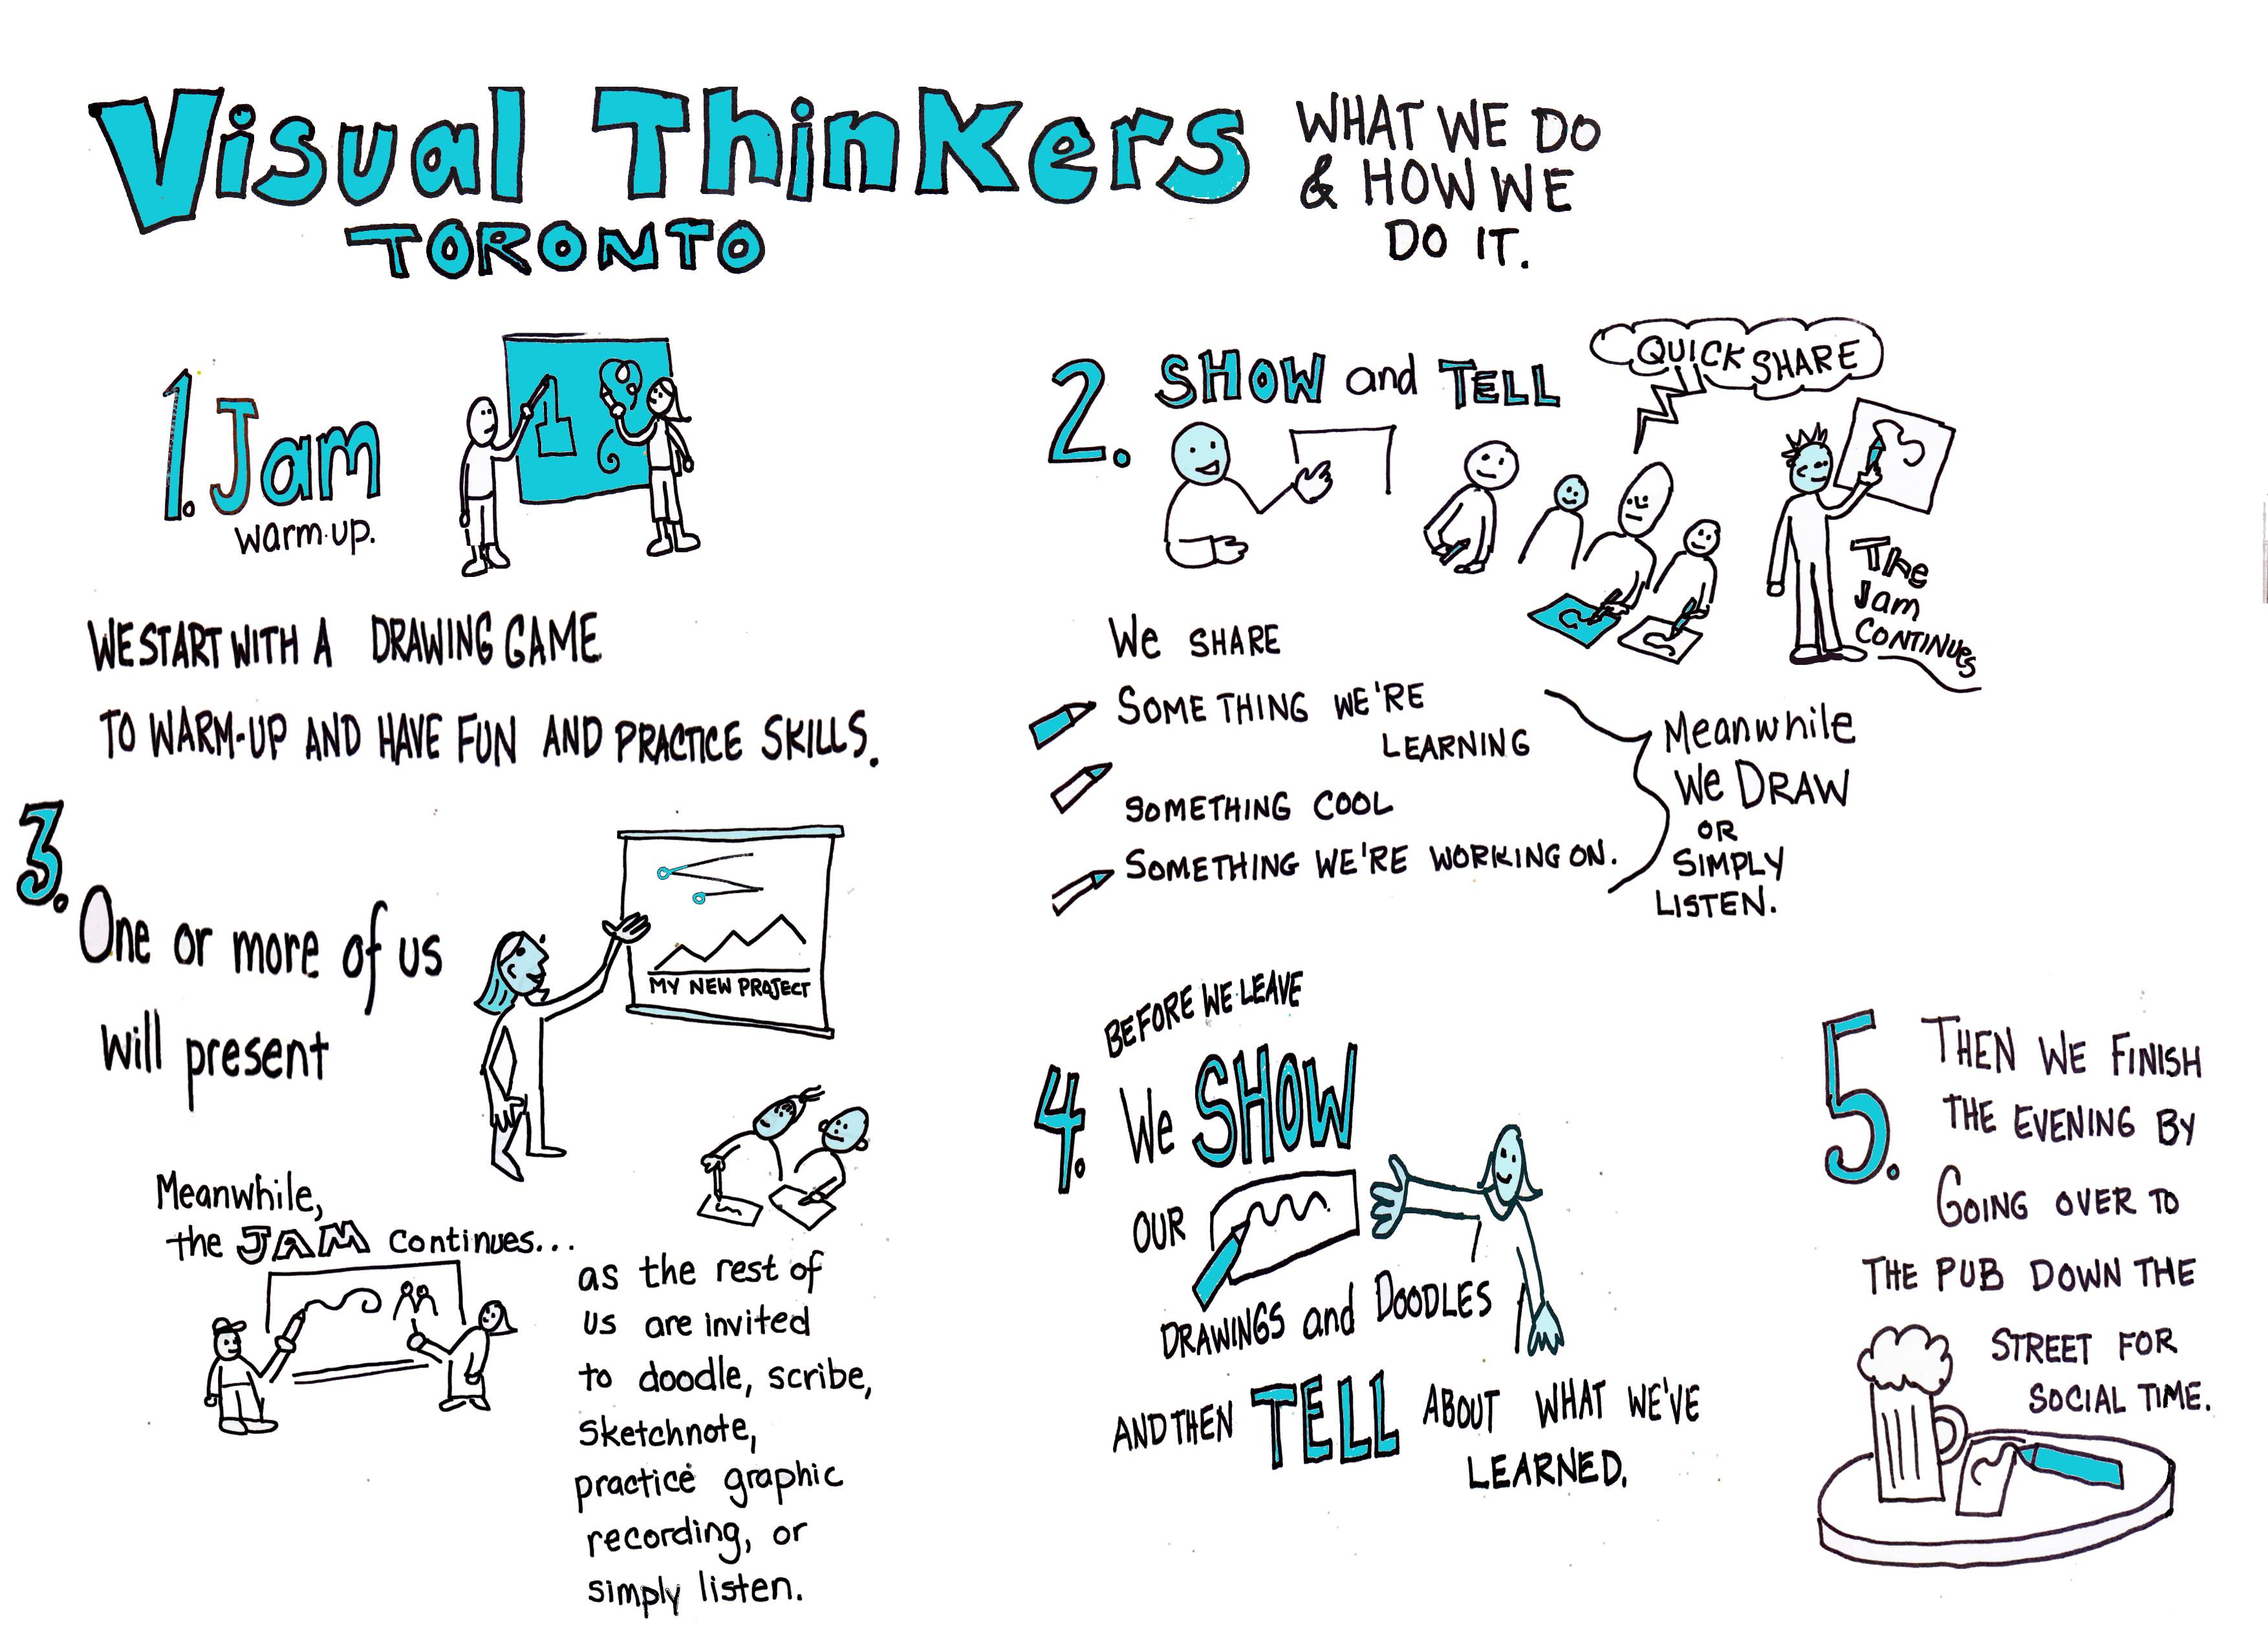 Visual Thinkers Toronto